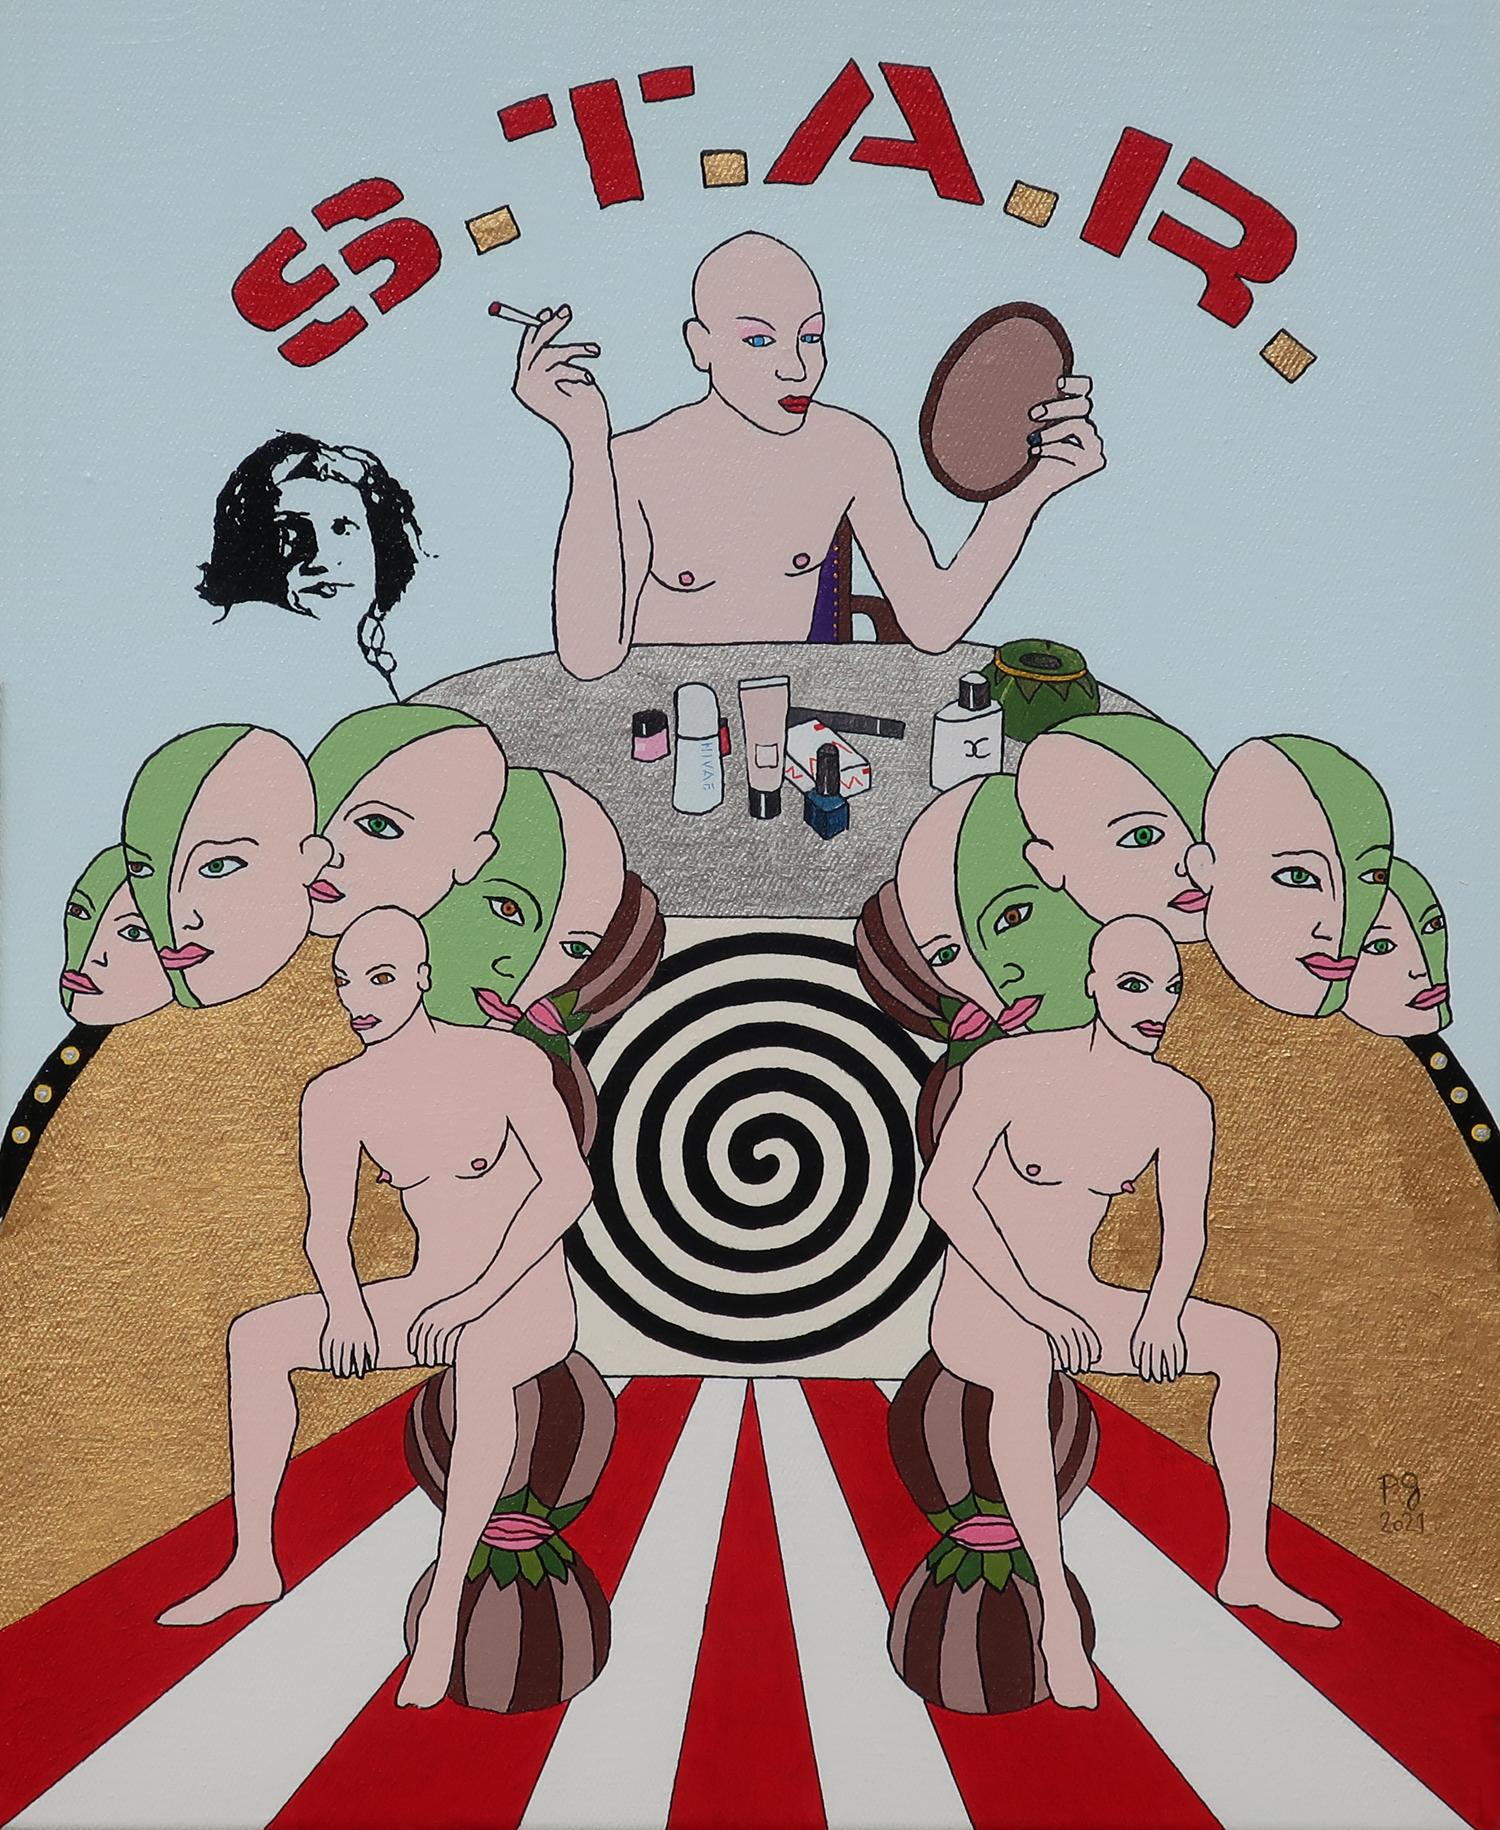 patrick gourgouillat - S.T.A.R. (Street Transvestite Action Revolutionaries) _ Feat. Sylvia Rivera [Viva La Vida] - 2021